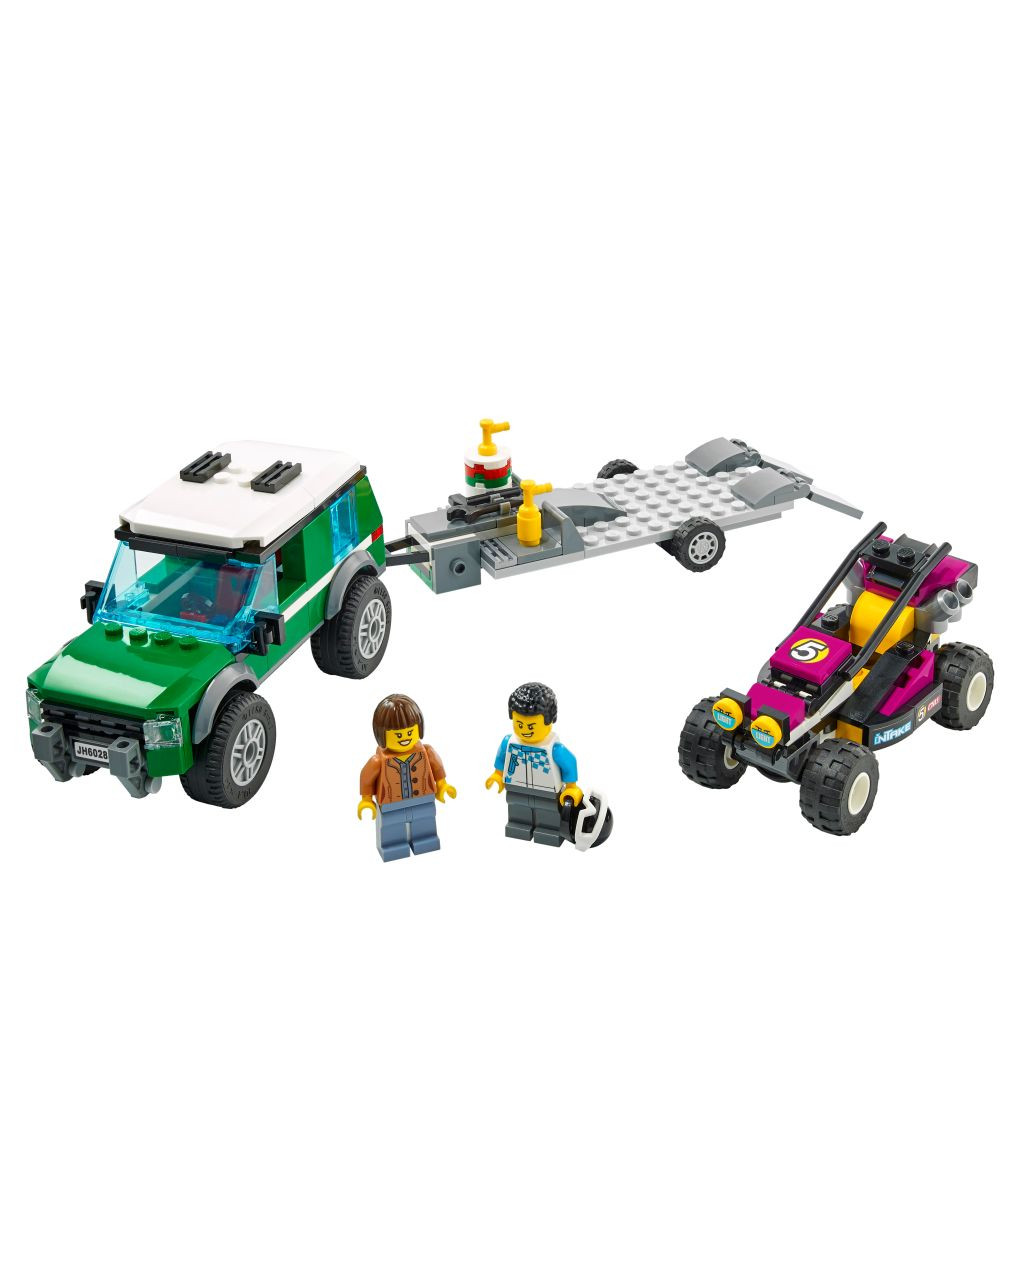 Lego city great vehicles - trasportatore di buggy da corsa - 60288 - LEGO